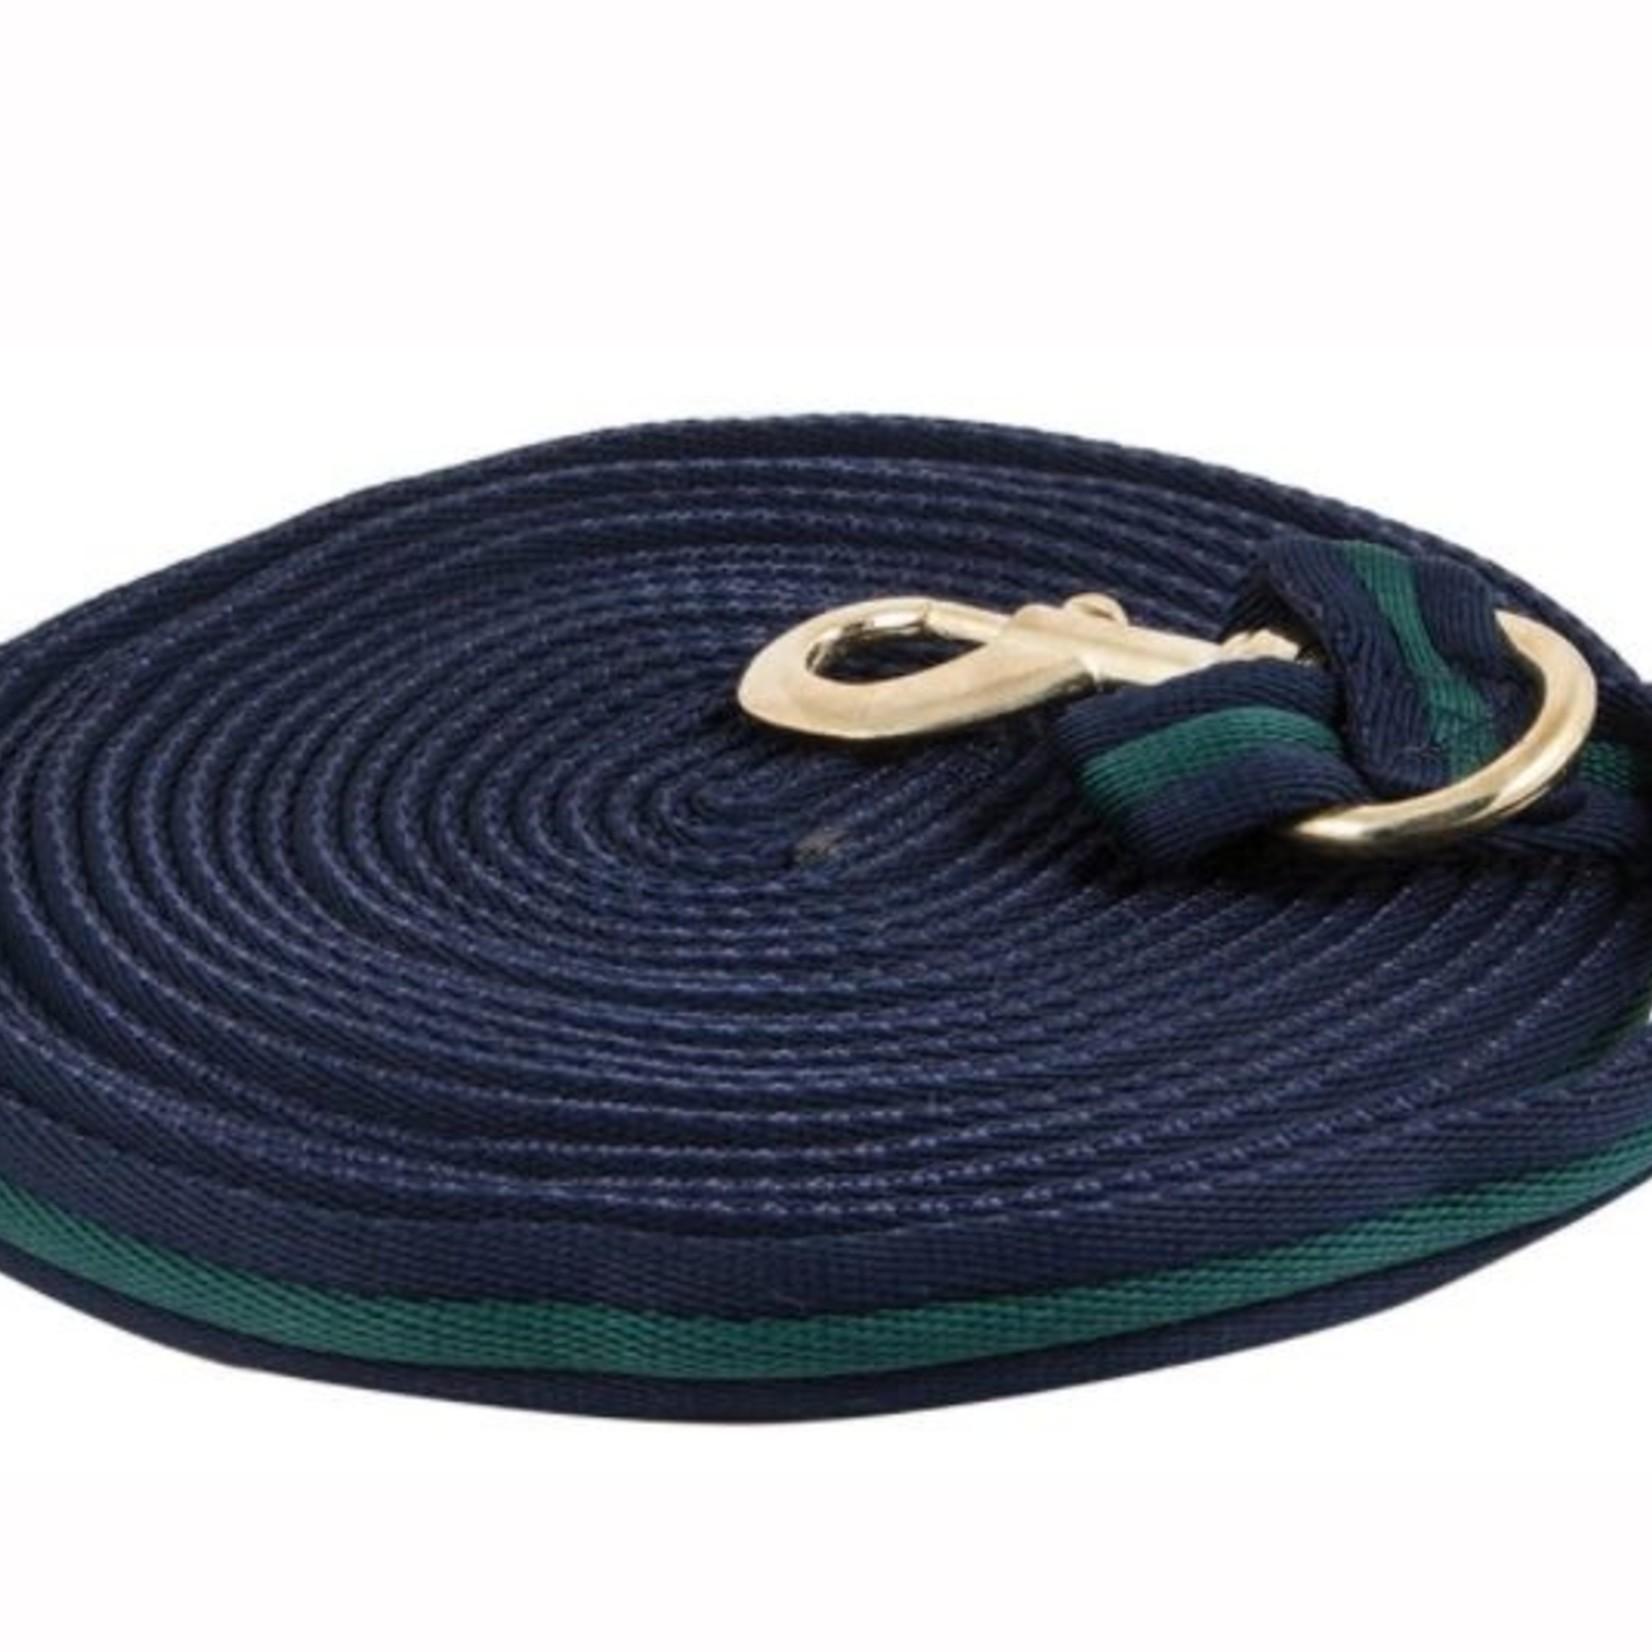 Cushion Lunge Line - Navy/Green